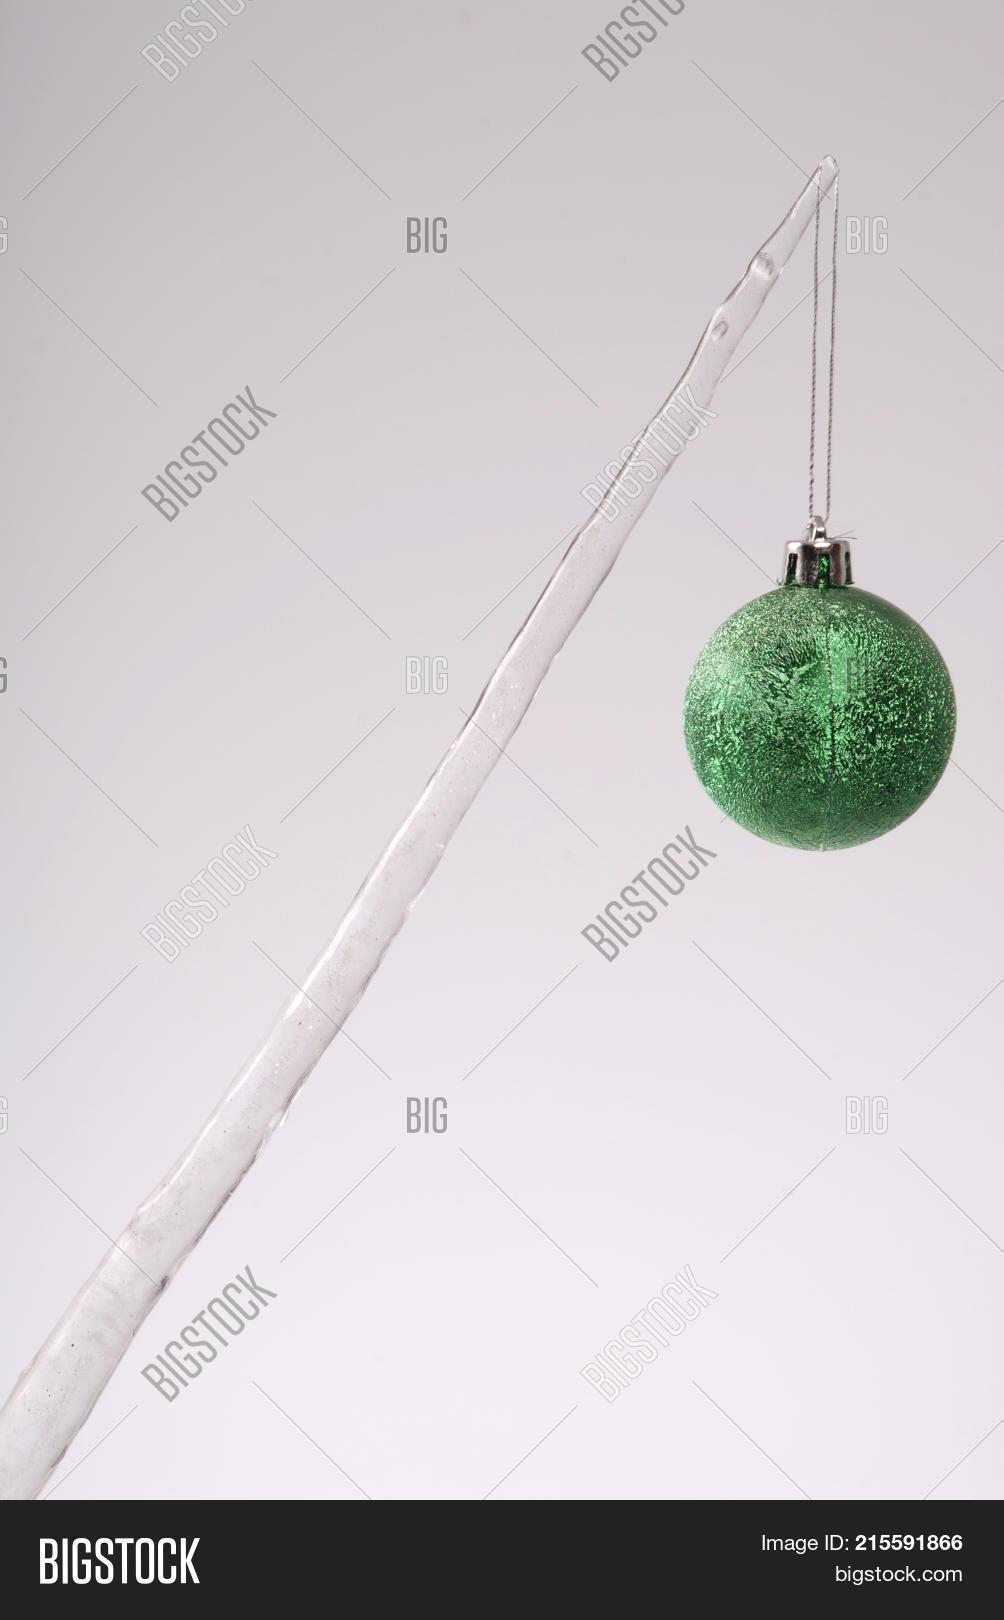 Icicle Christmas Tree Image & Photo (Free Trial) | Bigstock